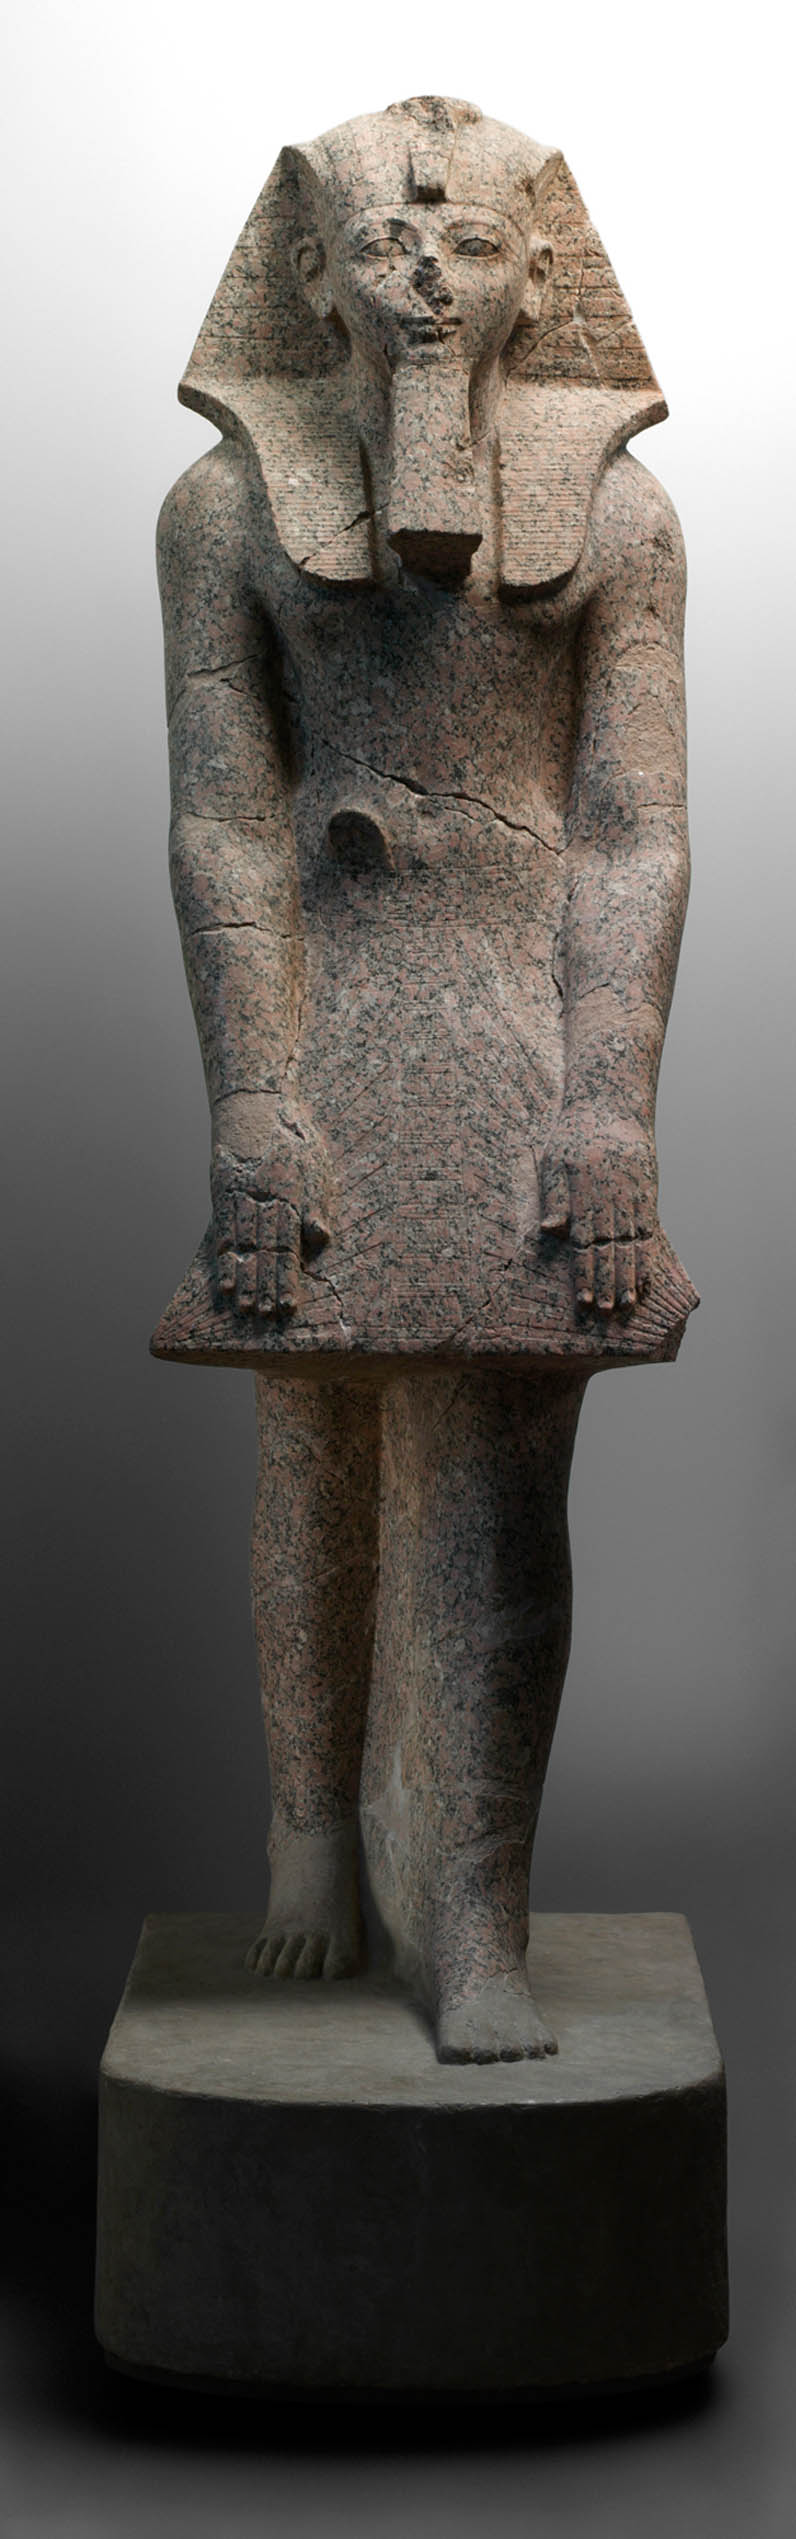 Standing Statue of Hatshepsut